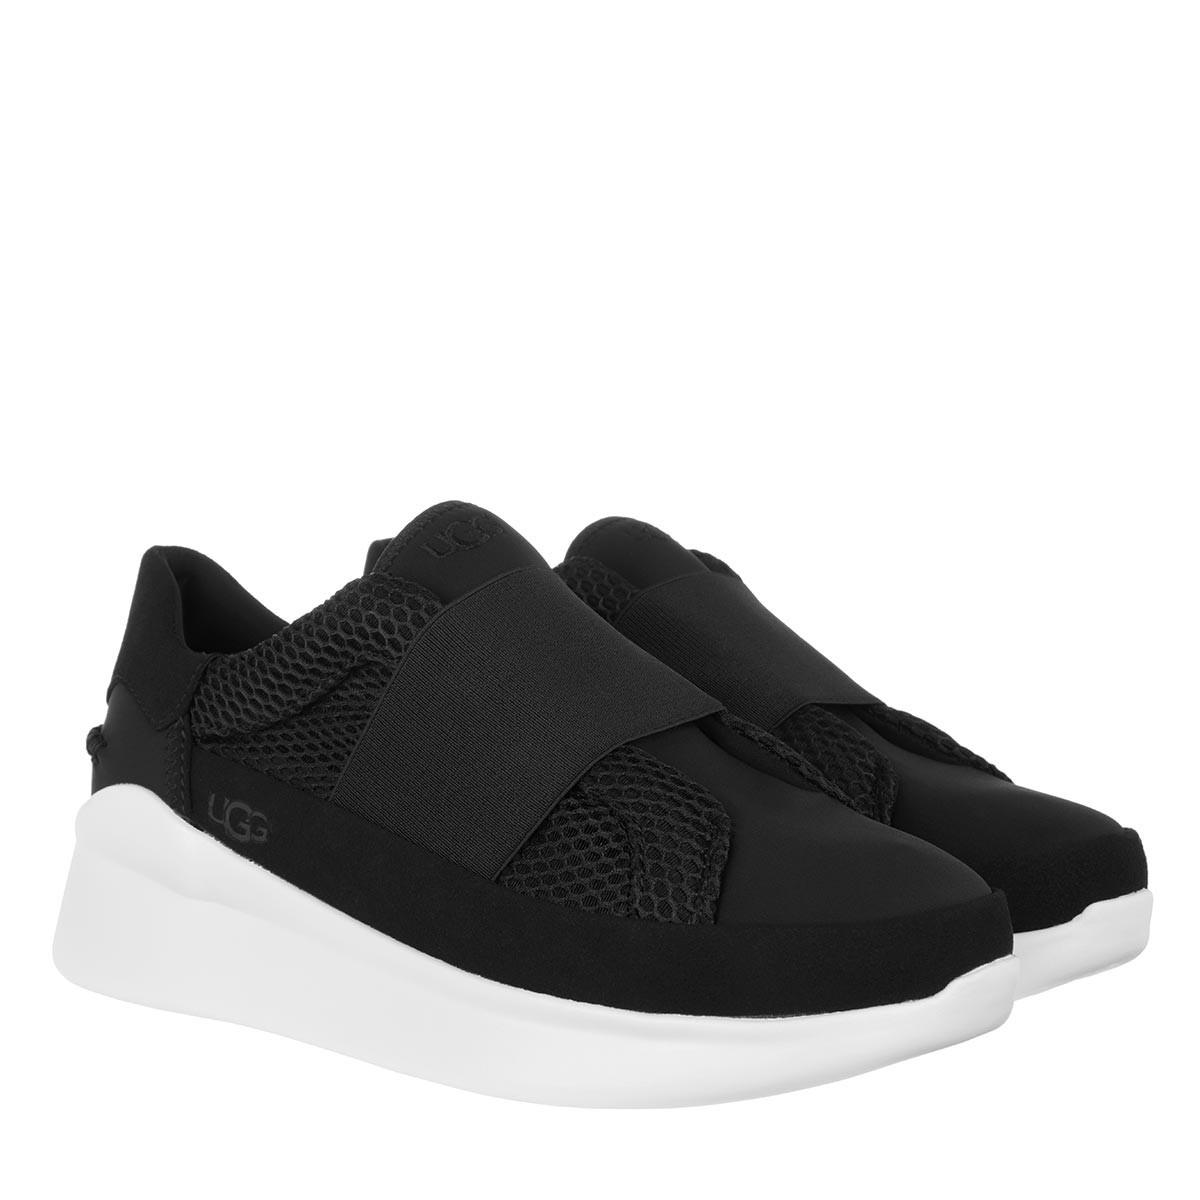 UGG Sneakers - Libu Lite Sneaker Black - in schwarz - für Damen